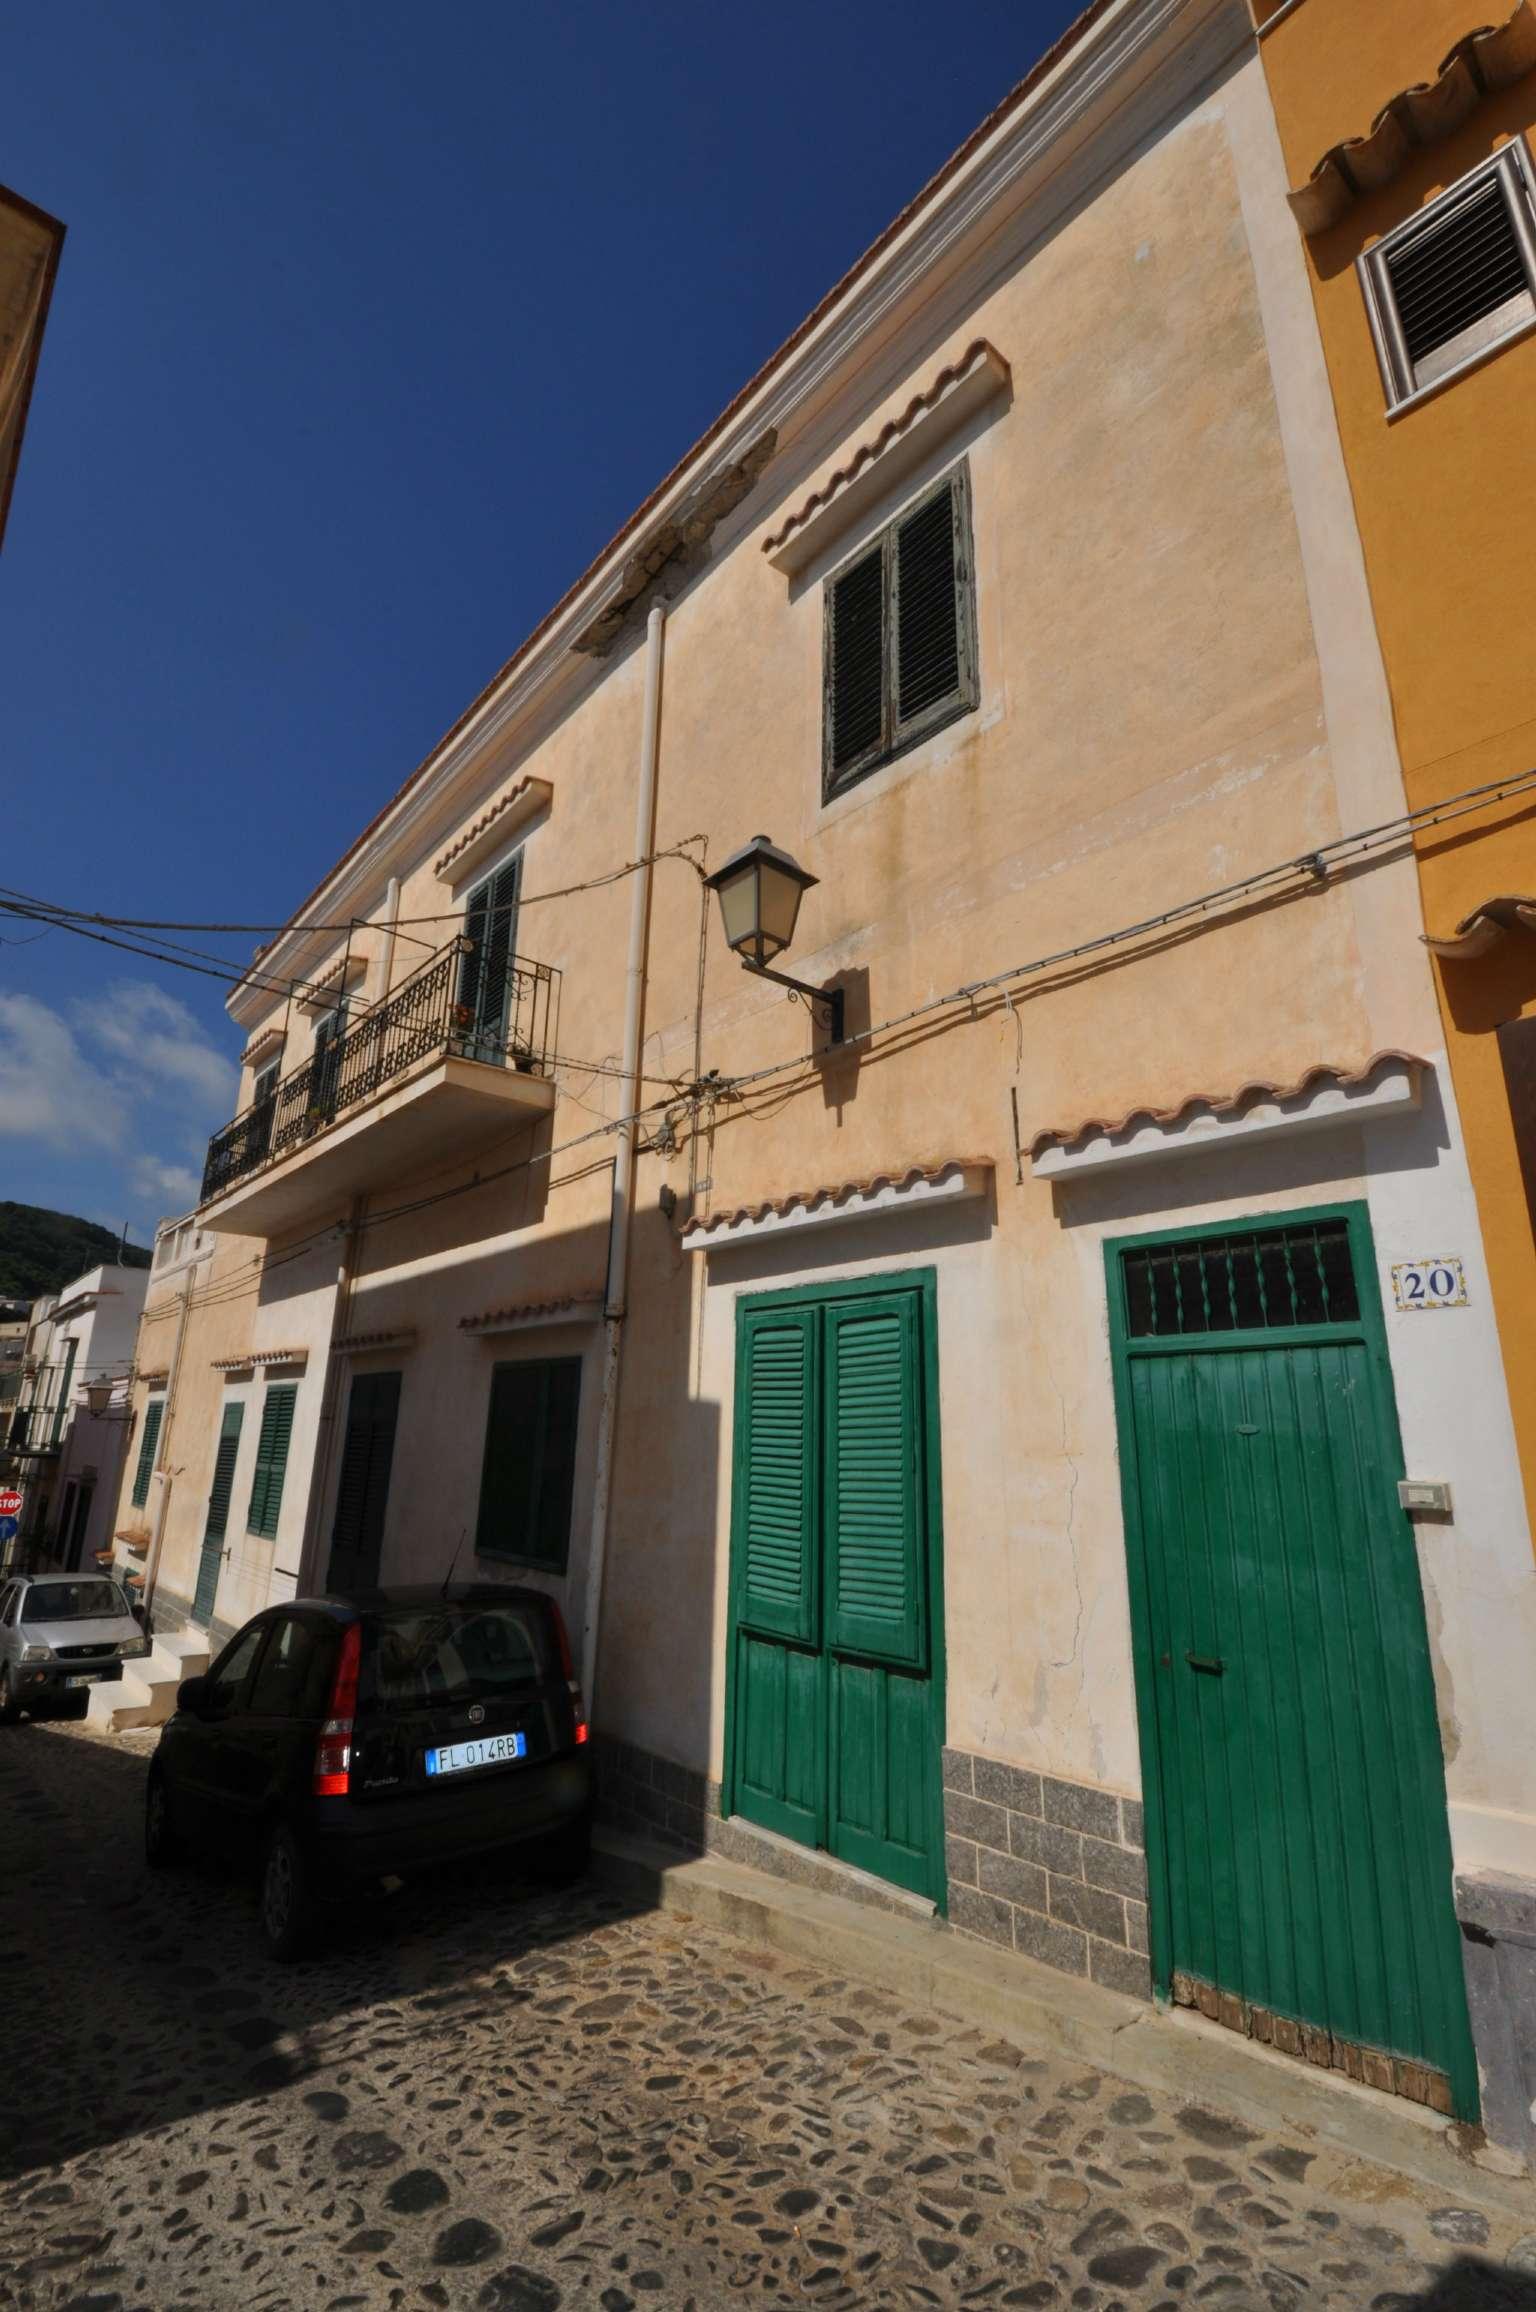 Casa indipendente in Vendita a Ustica: 5 locali, 185 mq